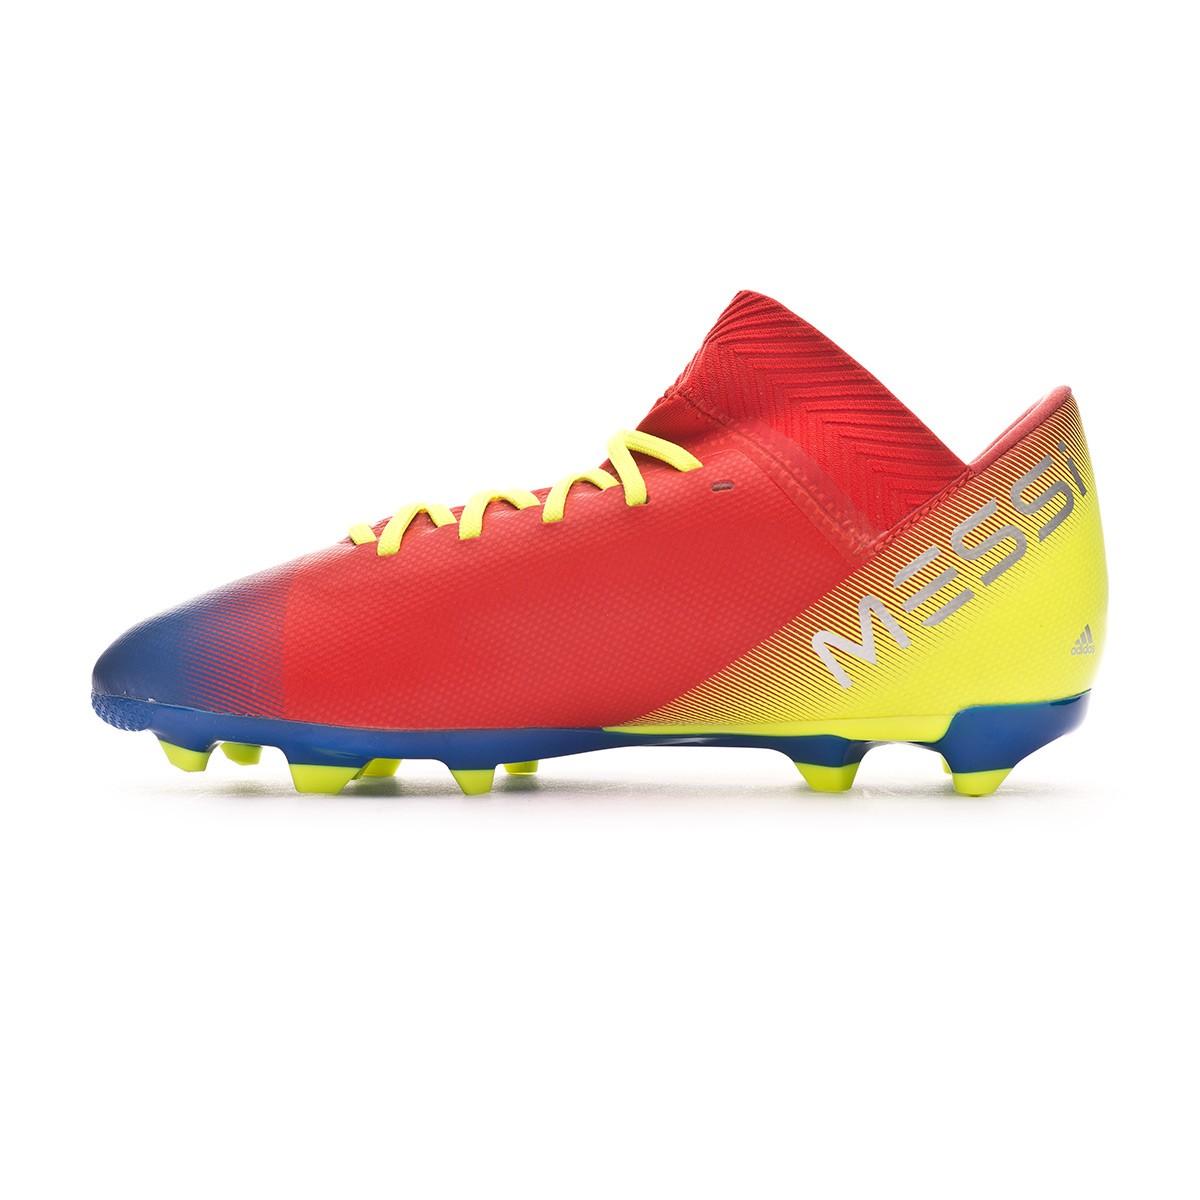 b59d12be973a Football Boots adidas Kids Nemeziz Messi 18.3 FG Active red-Silver metallic- Football blue - Tienda de fútbol Fútbol Emotion